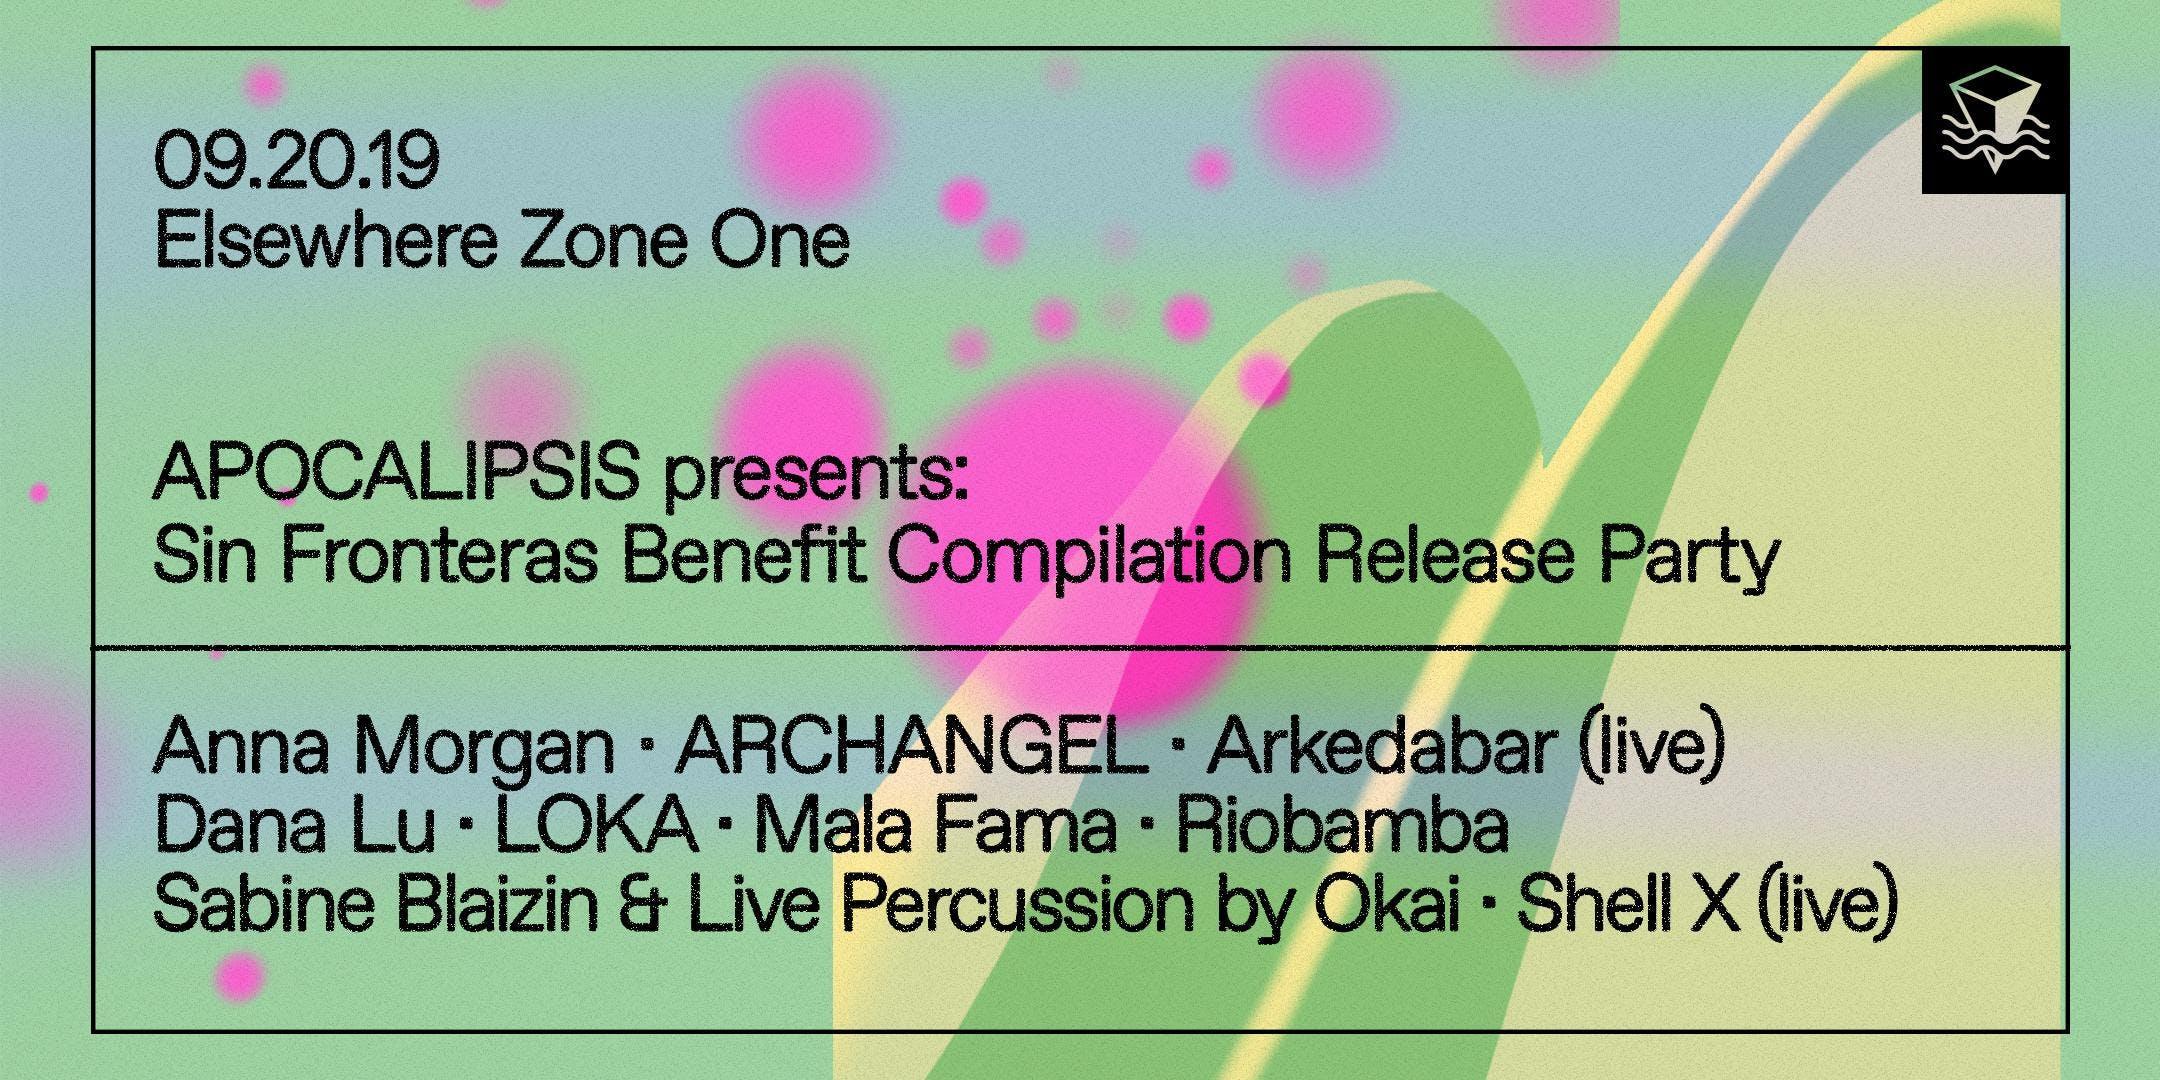 APOCALIPSIS Presents: Sin Fronteras Benefit Compilation Release Party w/ Anna Morgan, ARCHANGEL, Arkedabar (Live), Dana Lu, LOKA, Mala Fama, Riobamba, Sabine Blaizin & Live Percussion by Okai and more